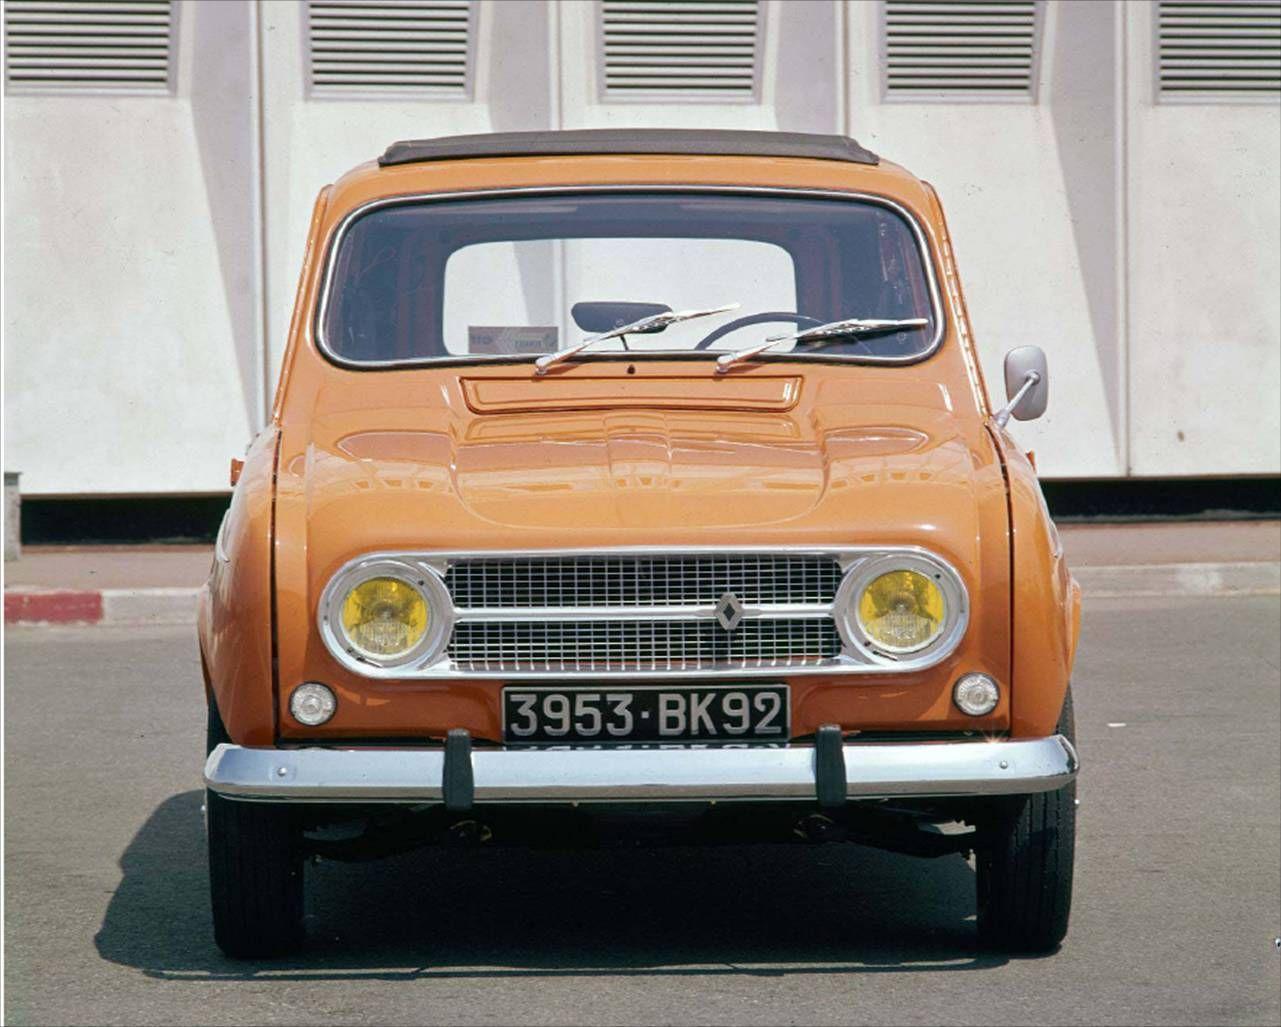 Renault 4 1973 4l Renault Voiture Renault Et Voiture Francaise